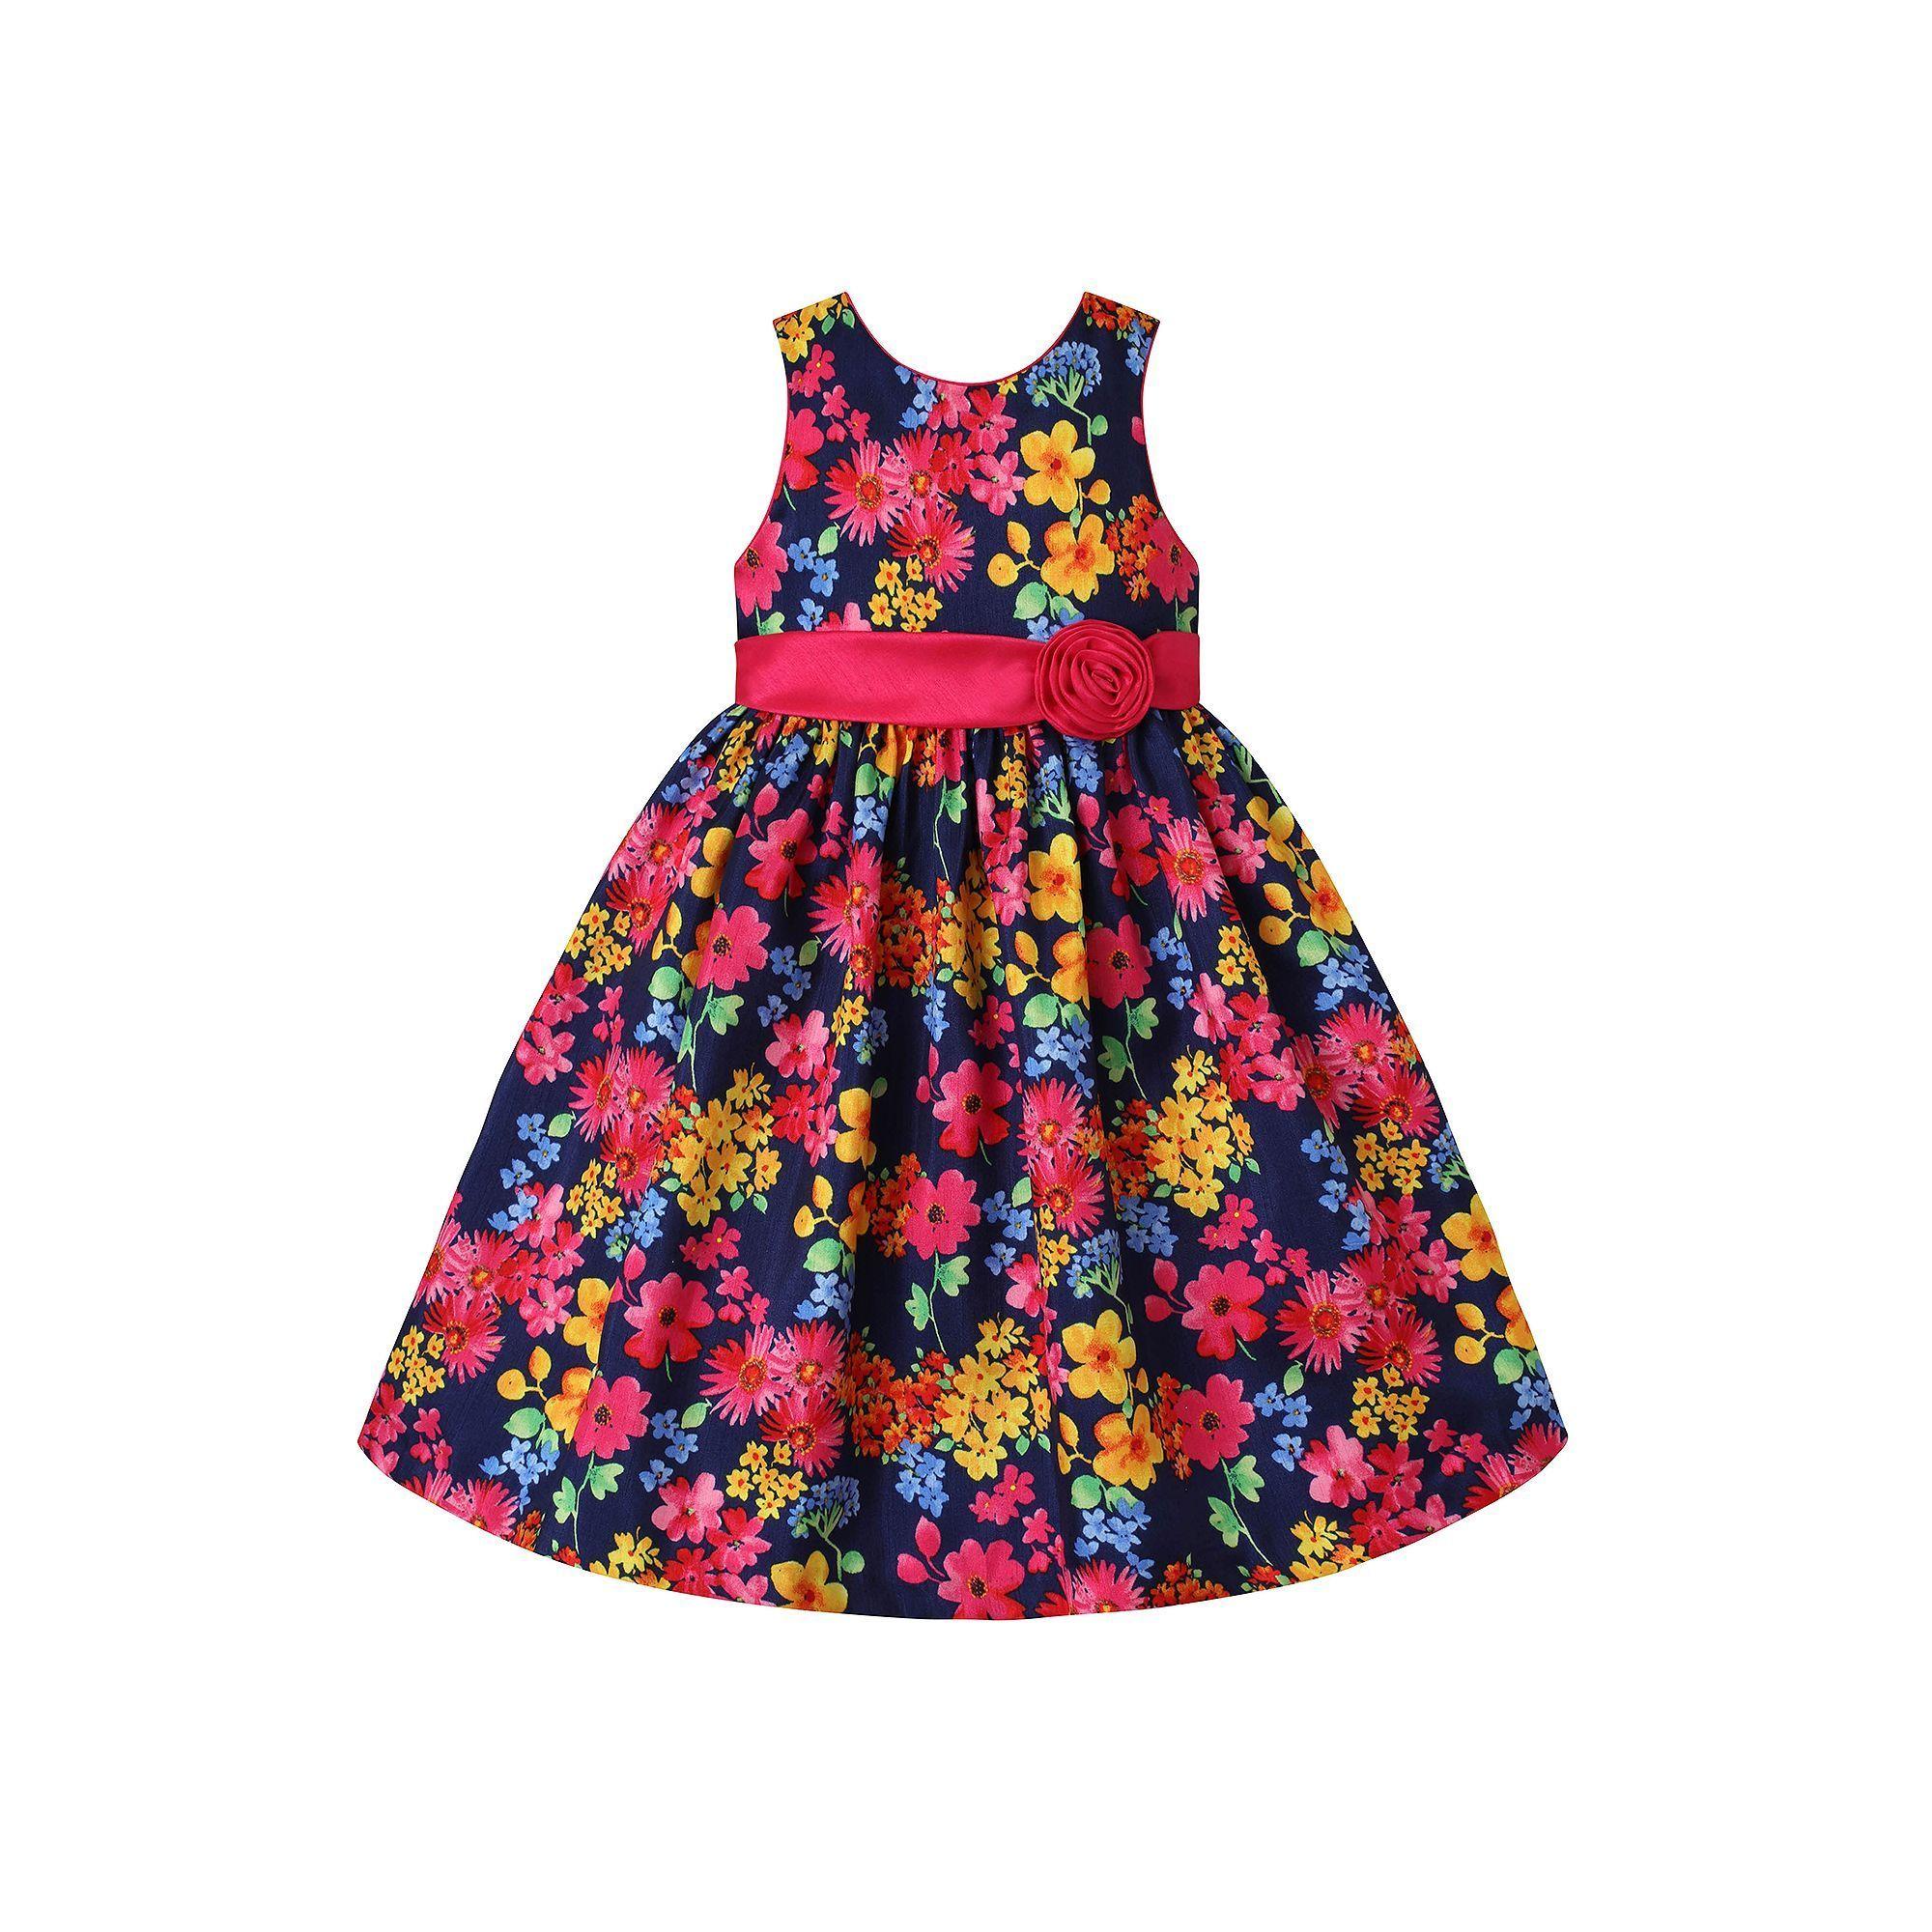 American Princess Girls 7-16 American Princess Navy (Blue) Floral Dress